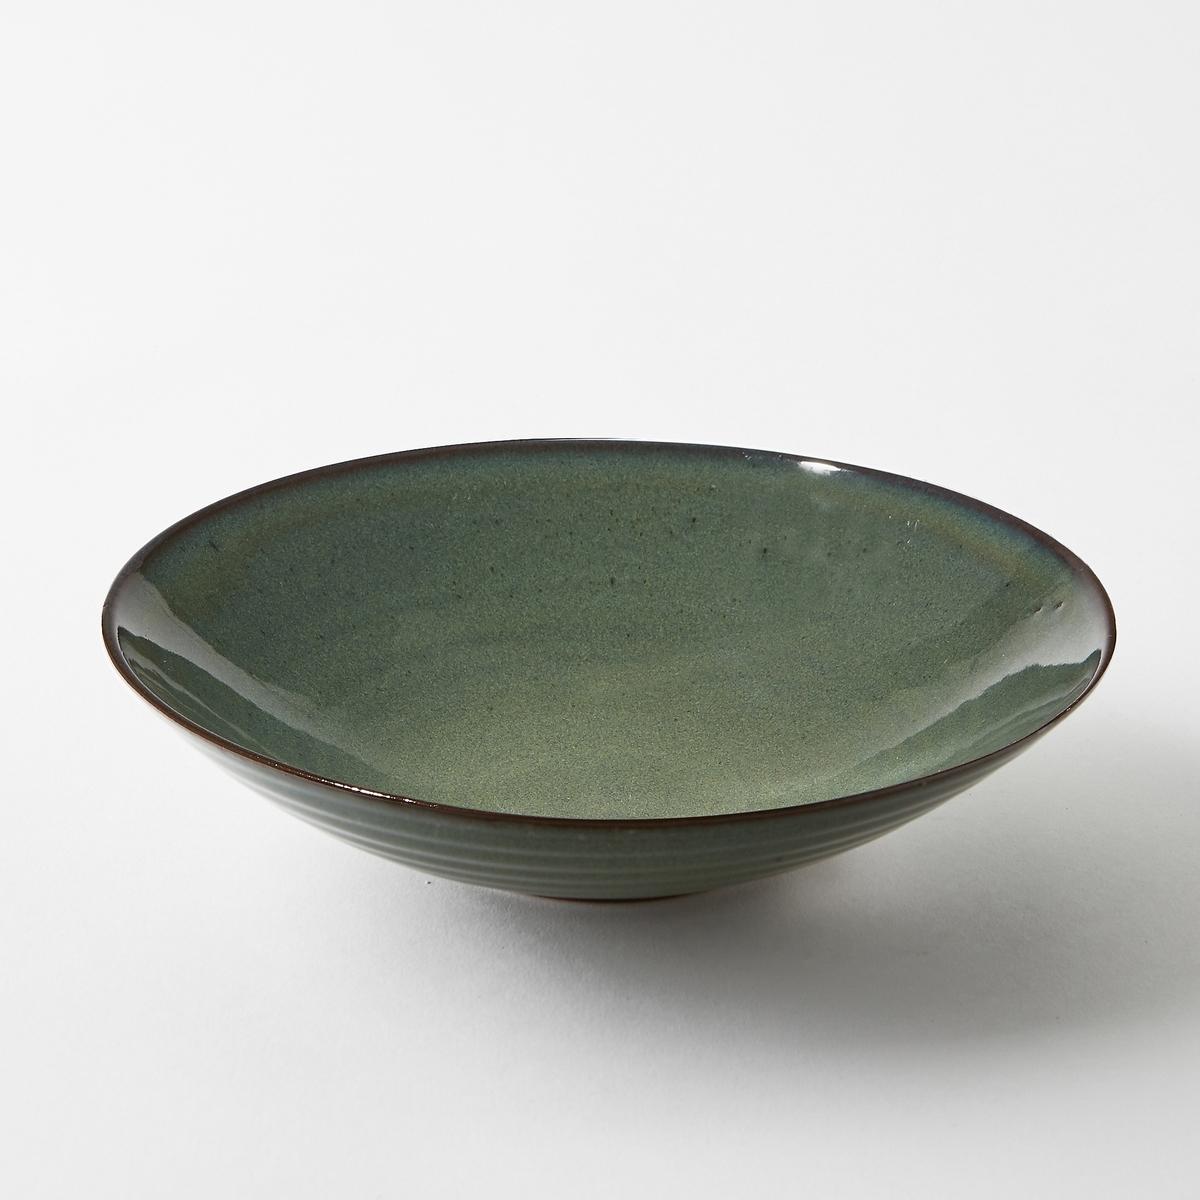 Тарелка глубокая из керамики, диаметр 23 см, Aqua от Serax